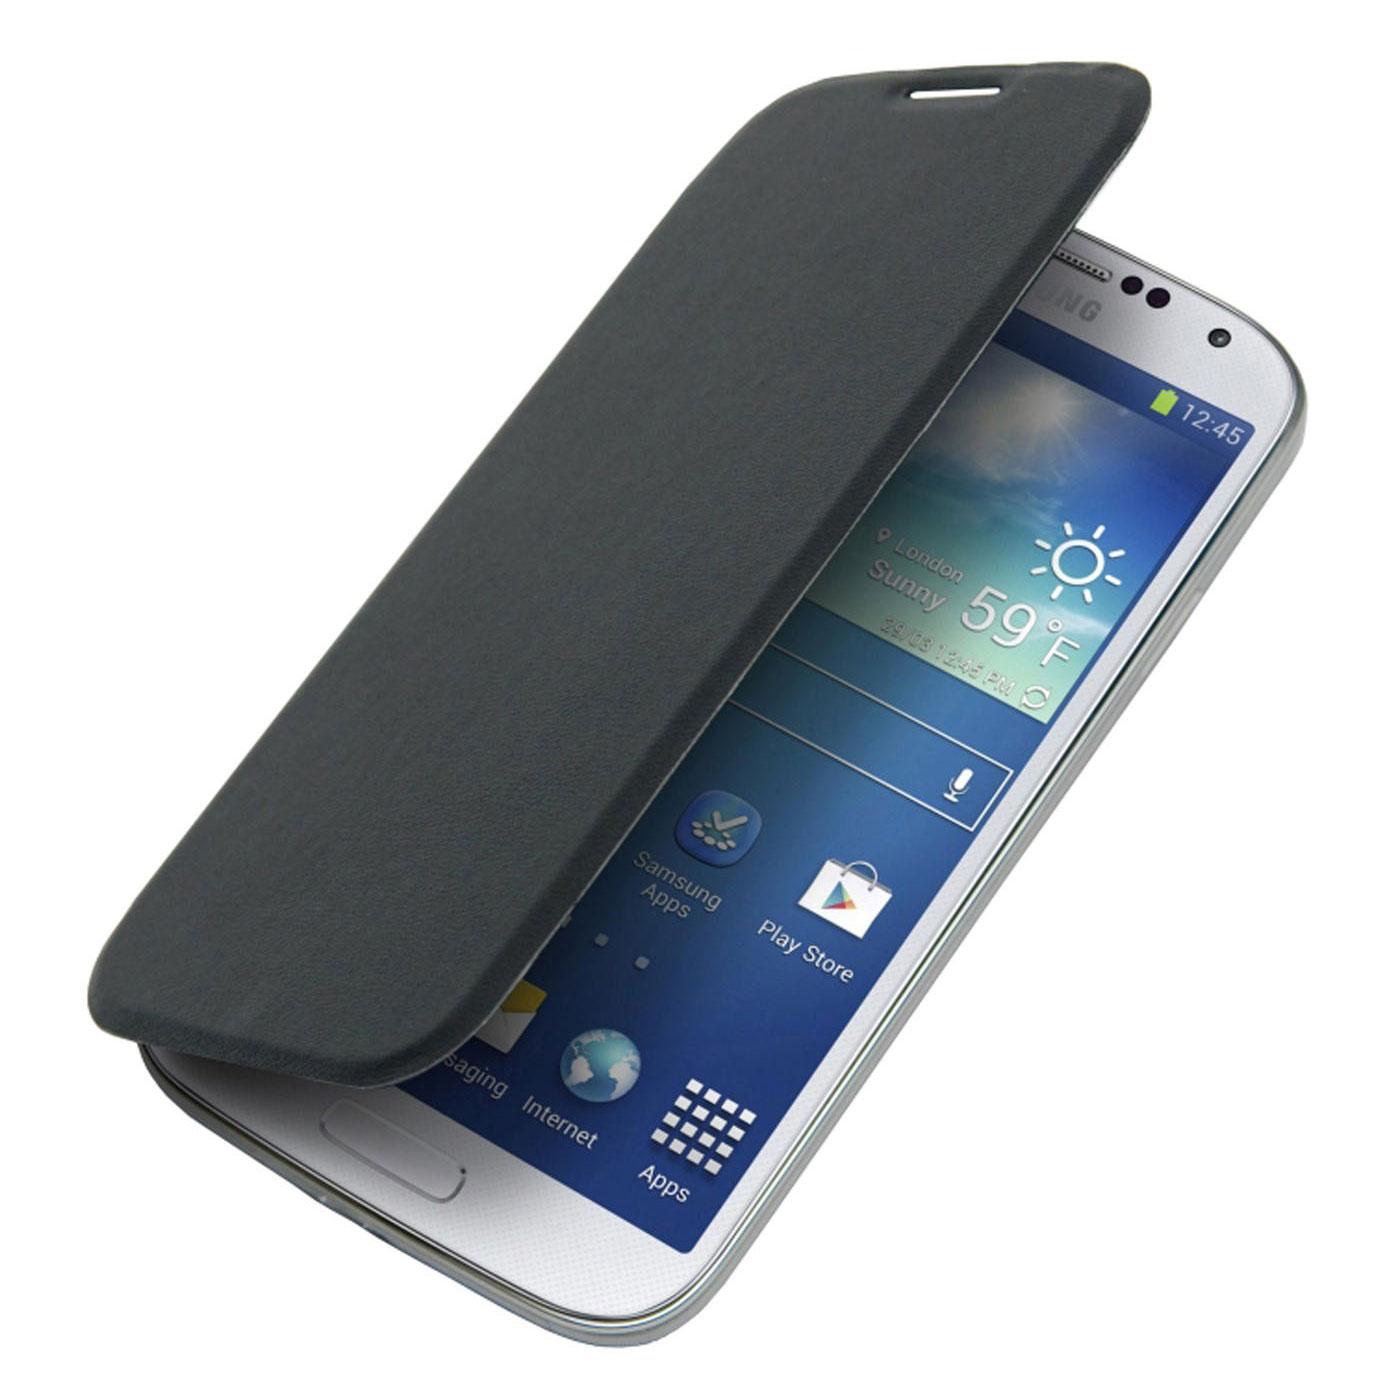 Etui téléphone Akashi Etui Folio Noir Galaxy J5 2016 Etui folio noir en simili cuir pour Samsung Galaxy J5 2016